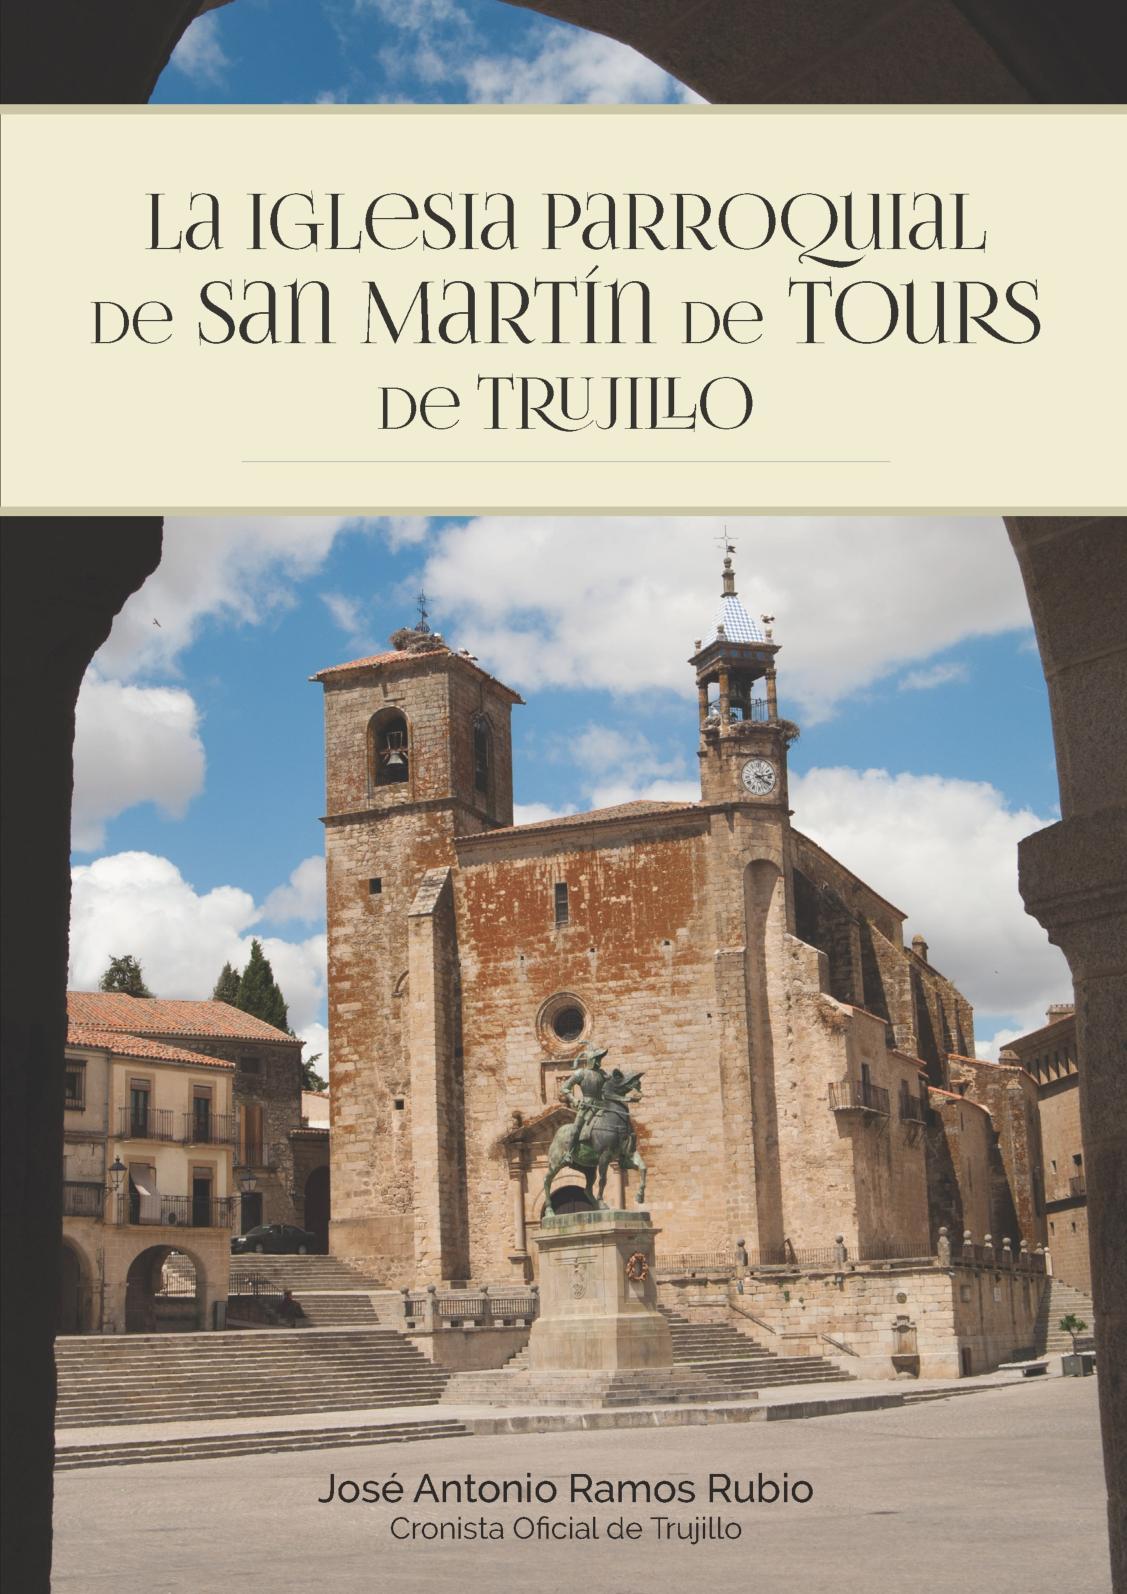 Calaméo - La Iglesia parroquial de San Martín de Tours en Trujillo ...